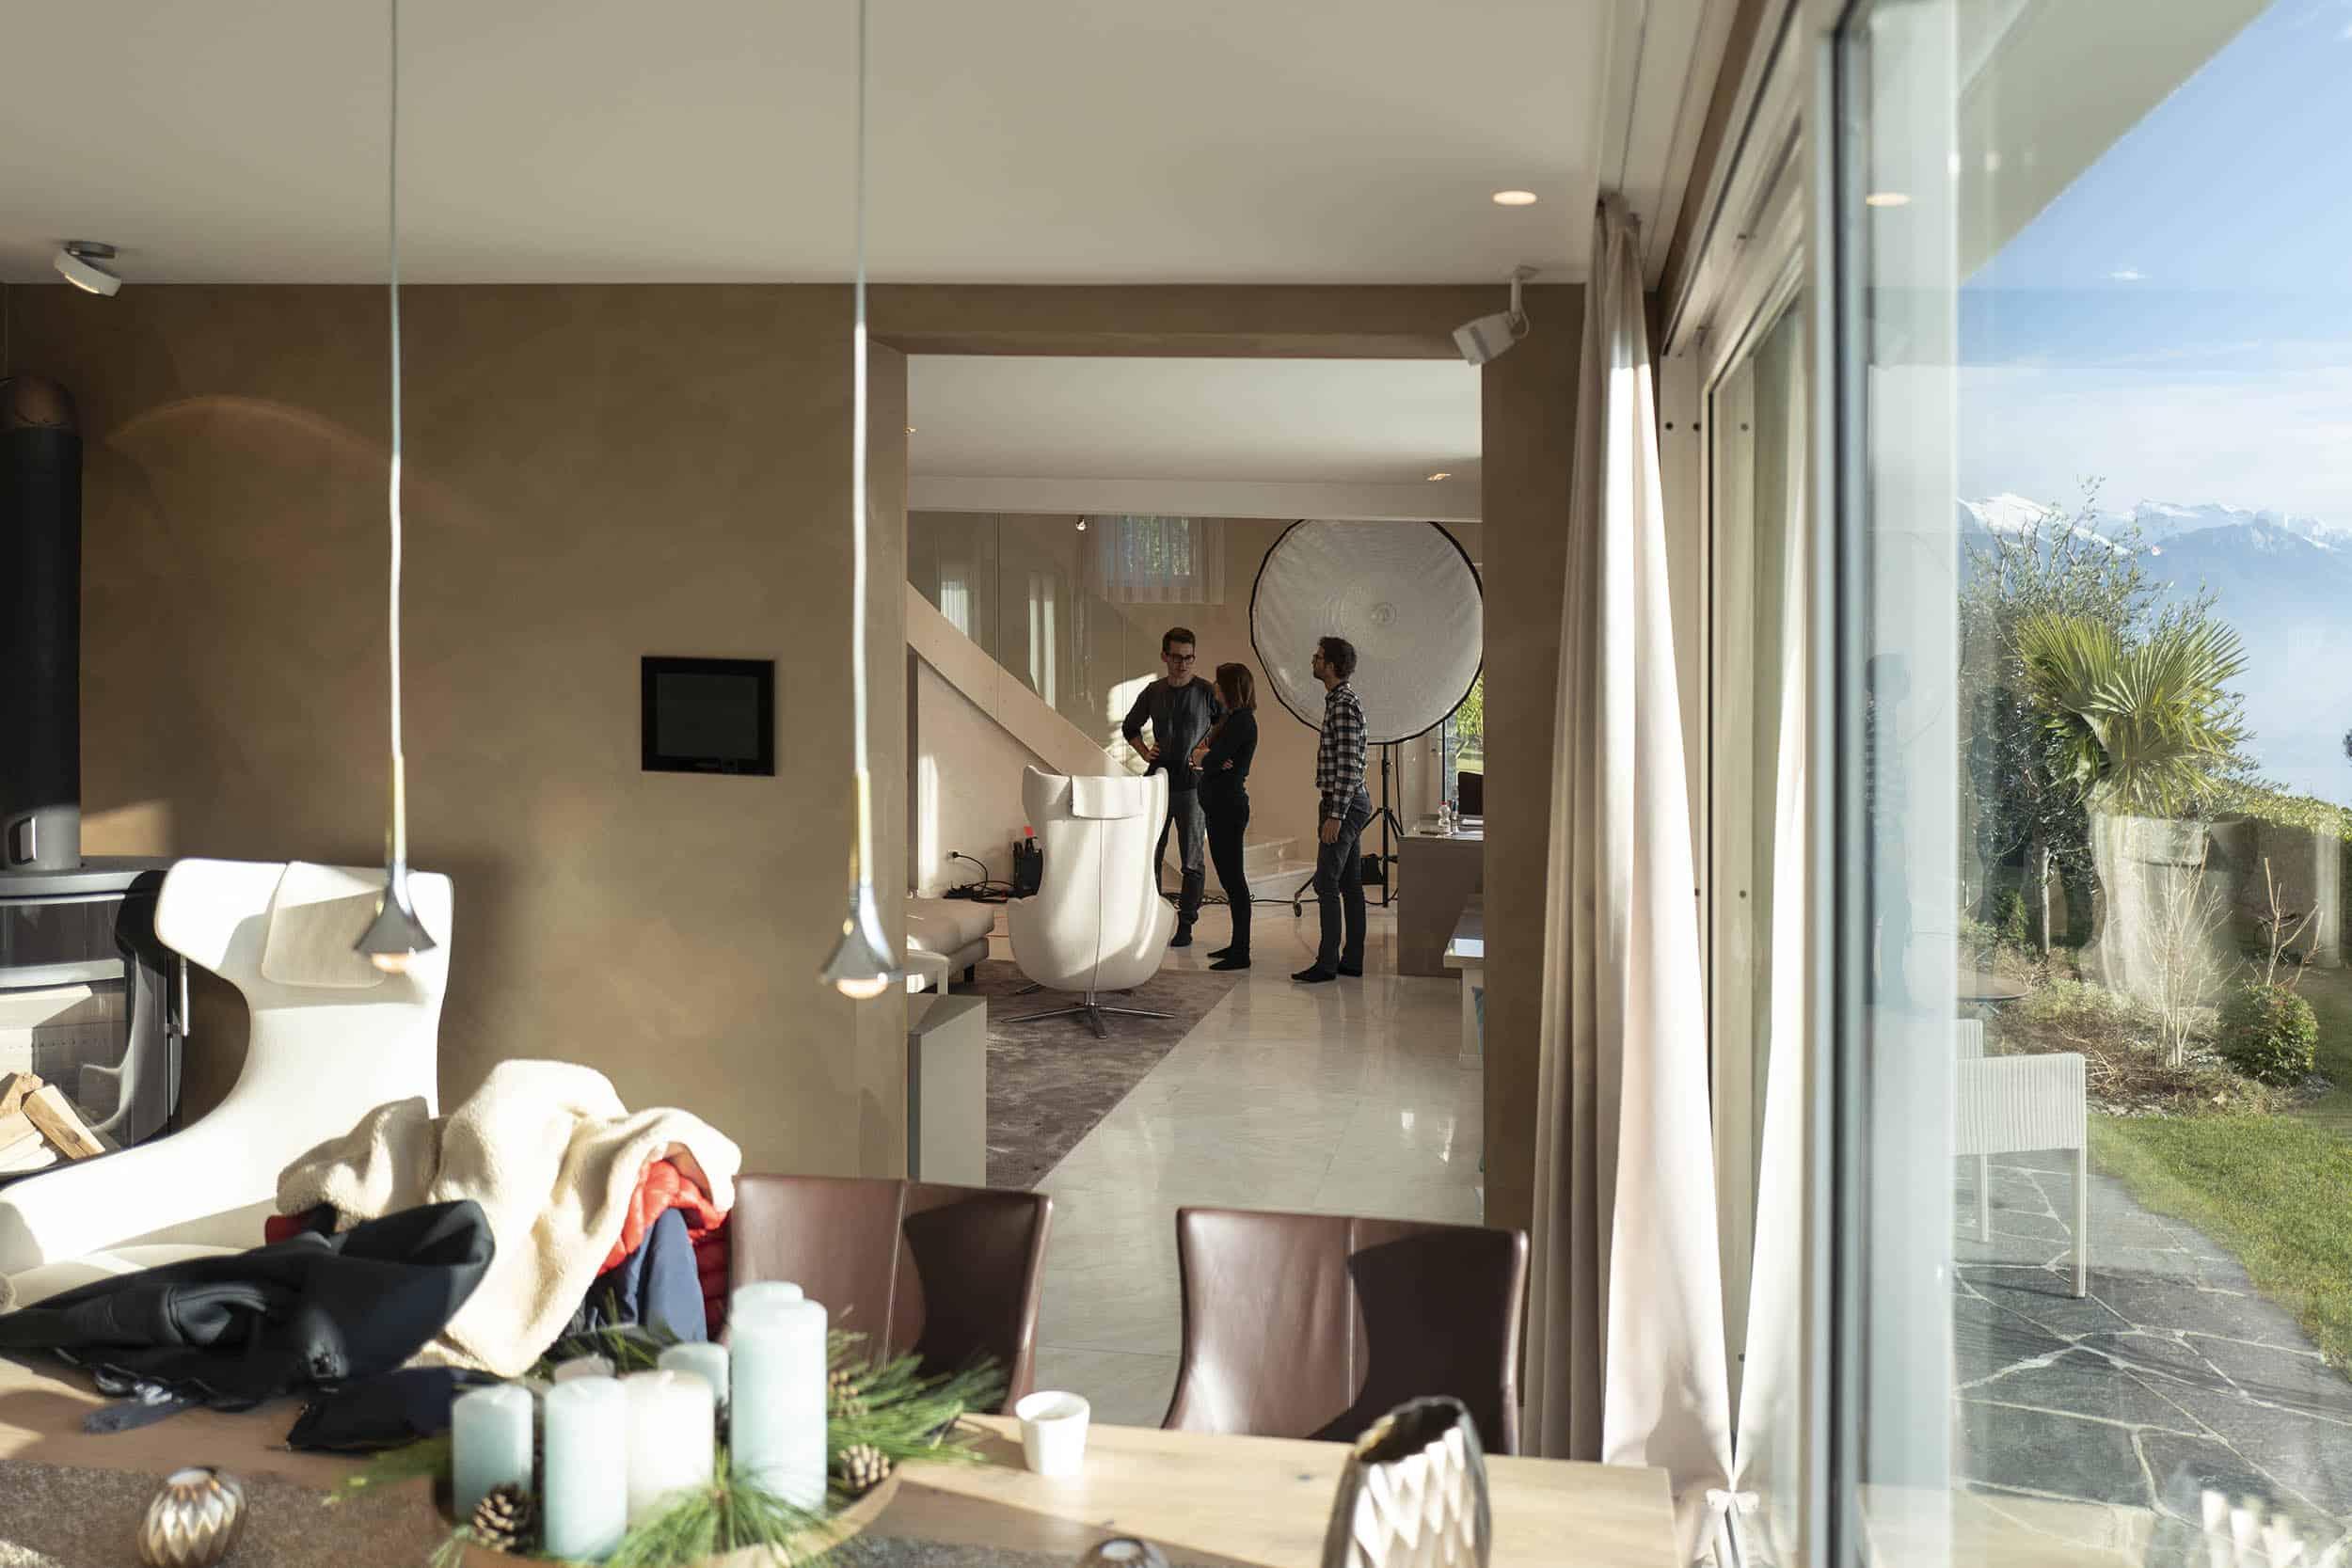 studio-ignatov-elco-hygge-kampagne-schweiz-making-of-04